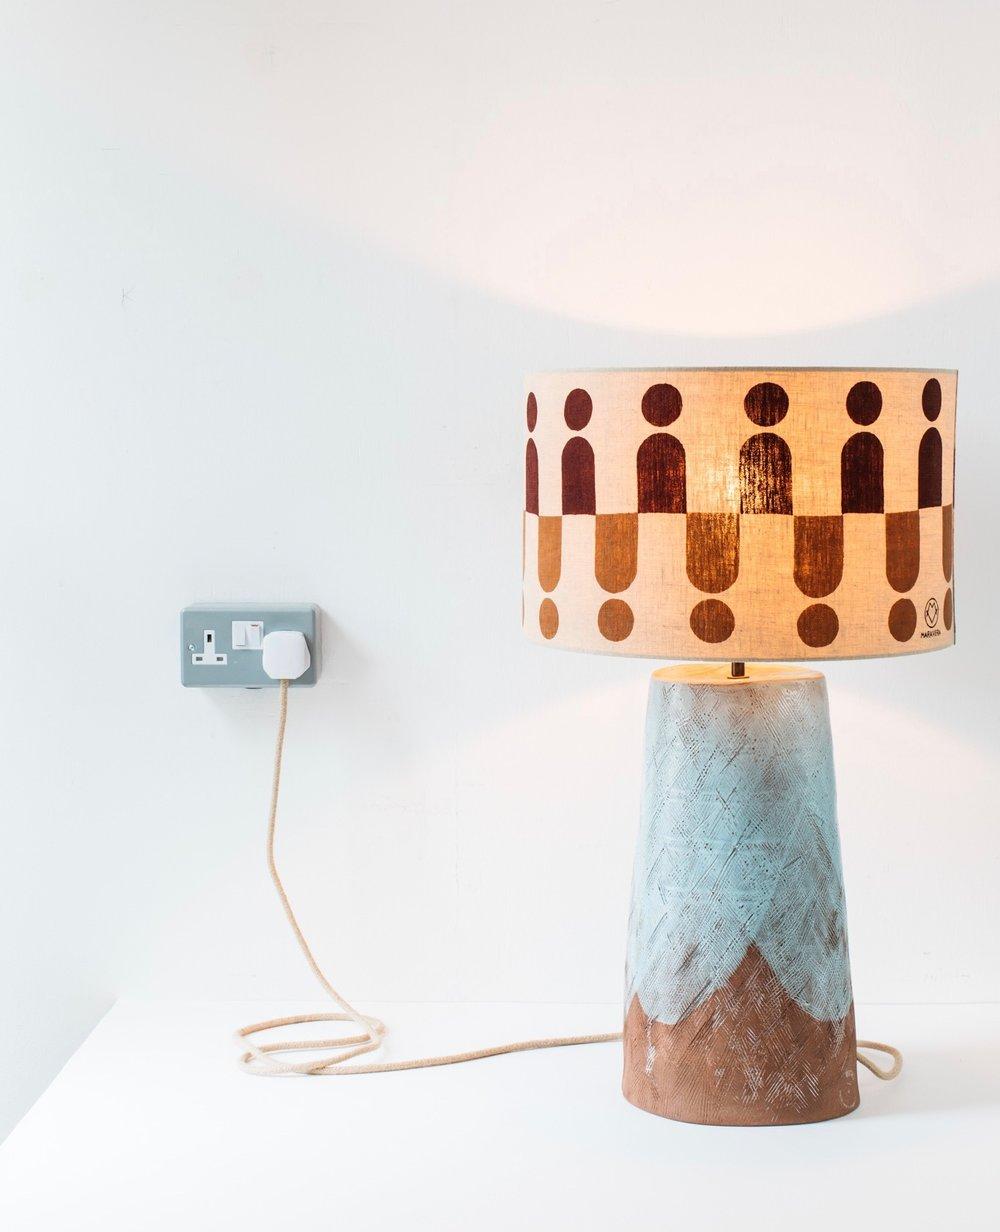 silviak_x_maravera+limited+edition+lamp